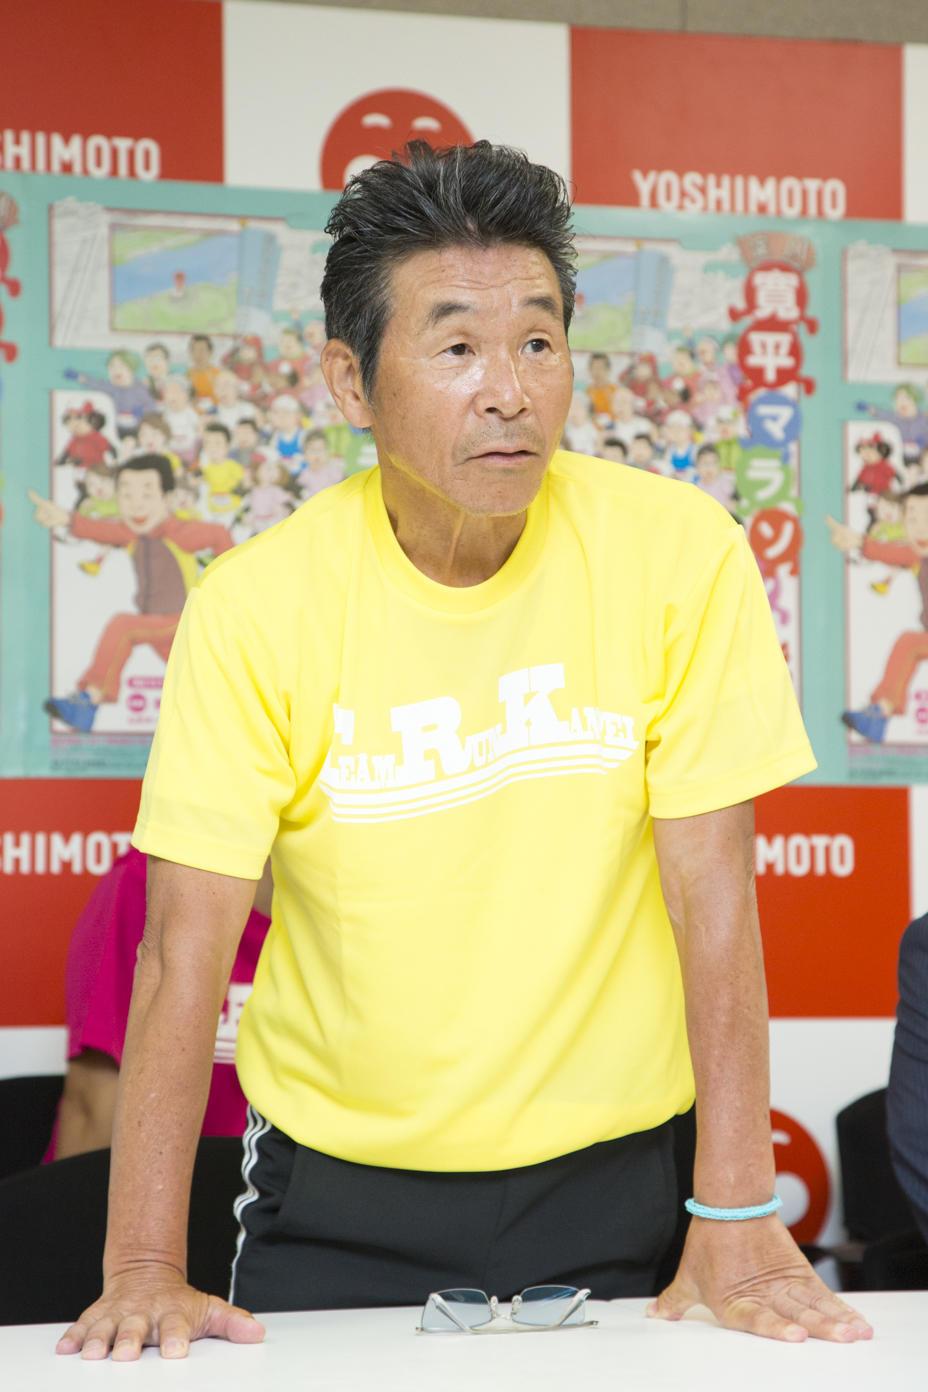 http://news.yoshimoto.co.jp/20170830175356-7ef84774944a6fea6359f74adea36b08e0c9758c.jpg